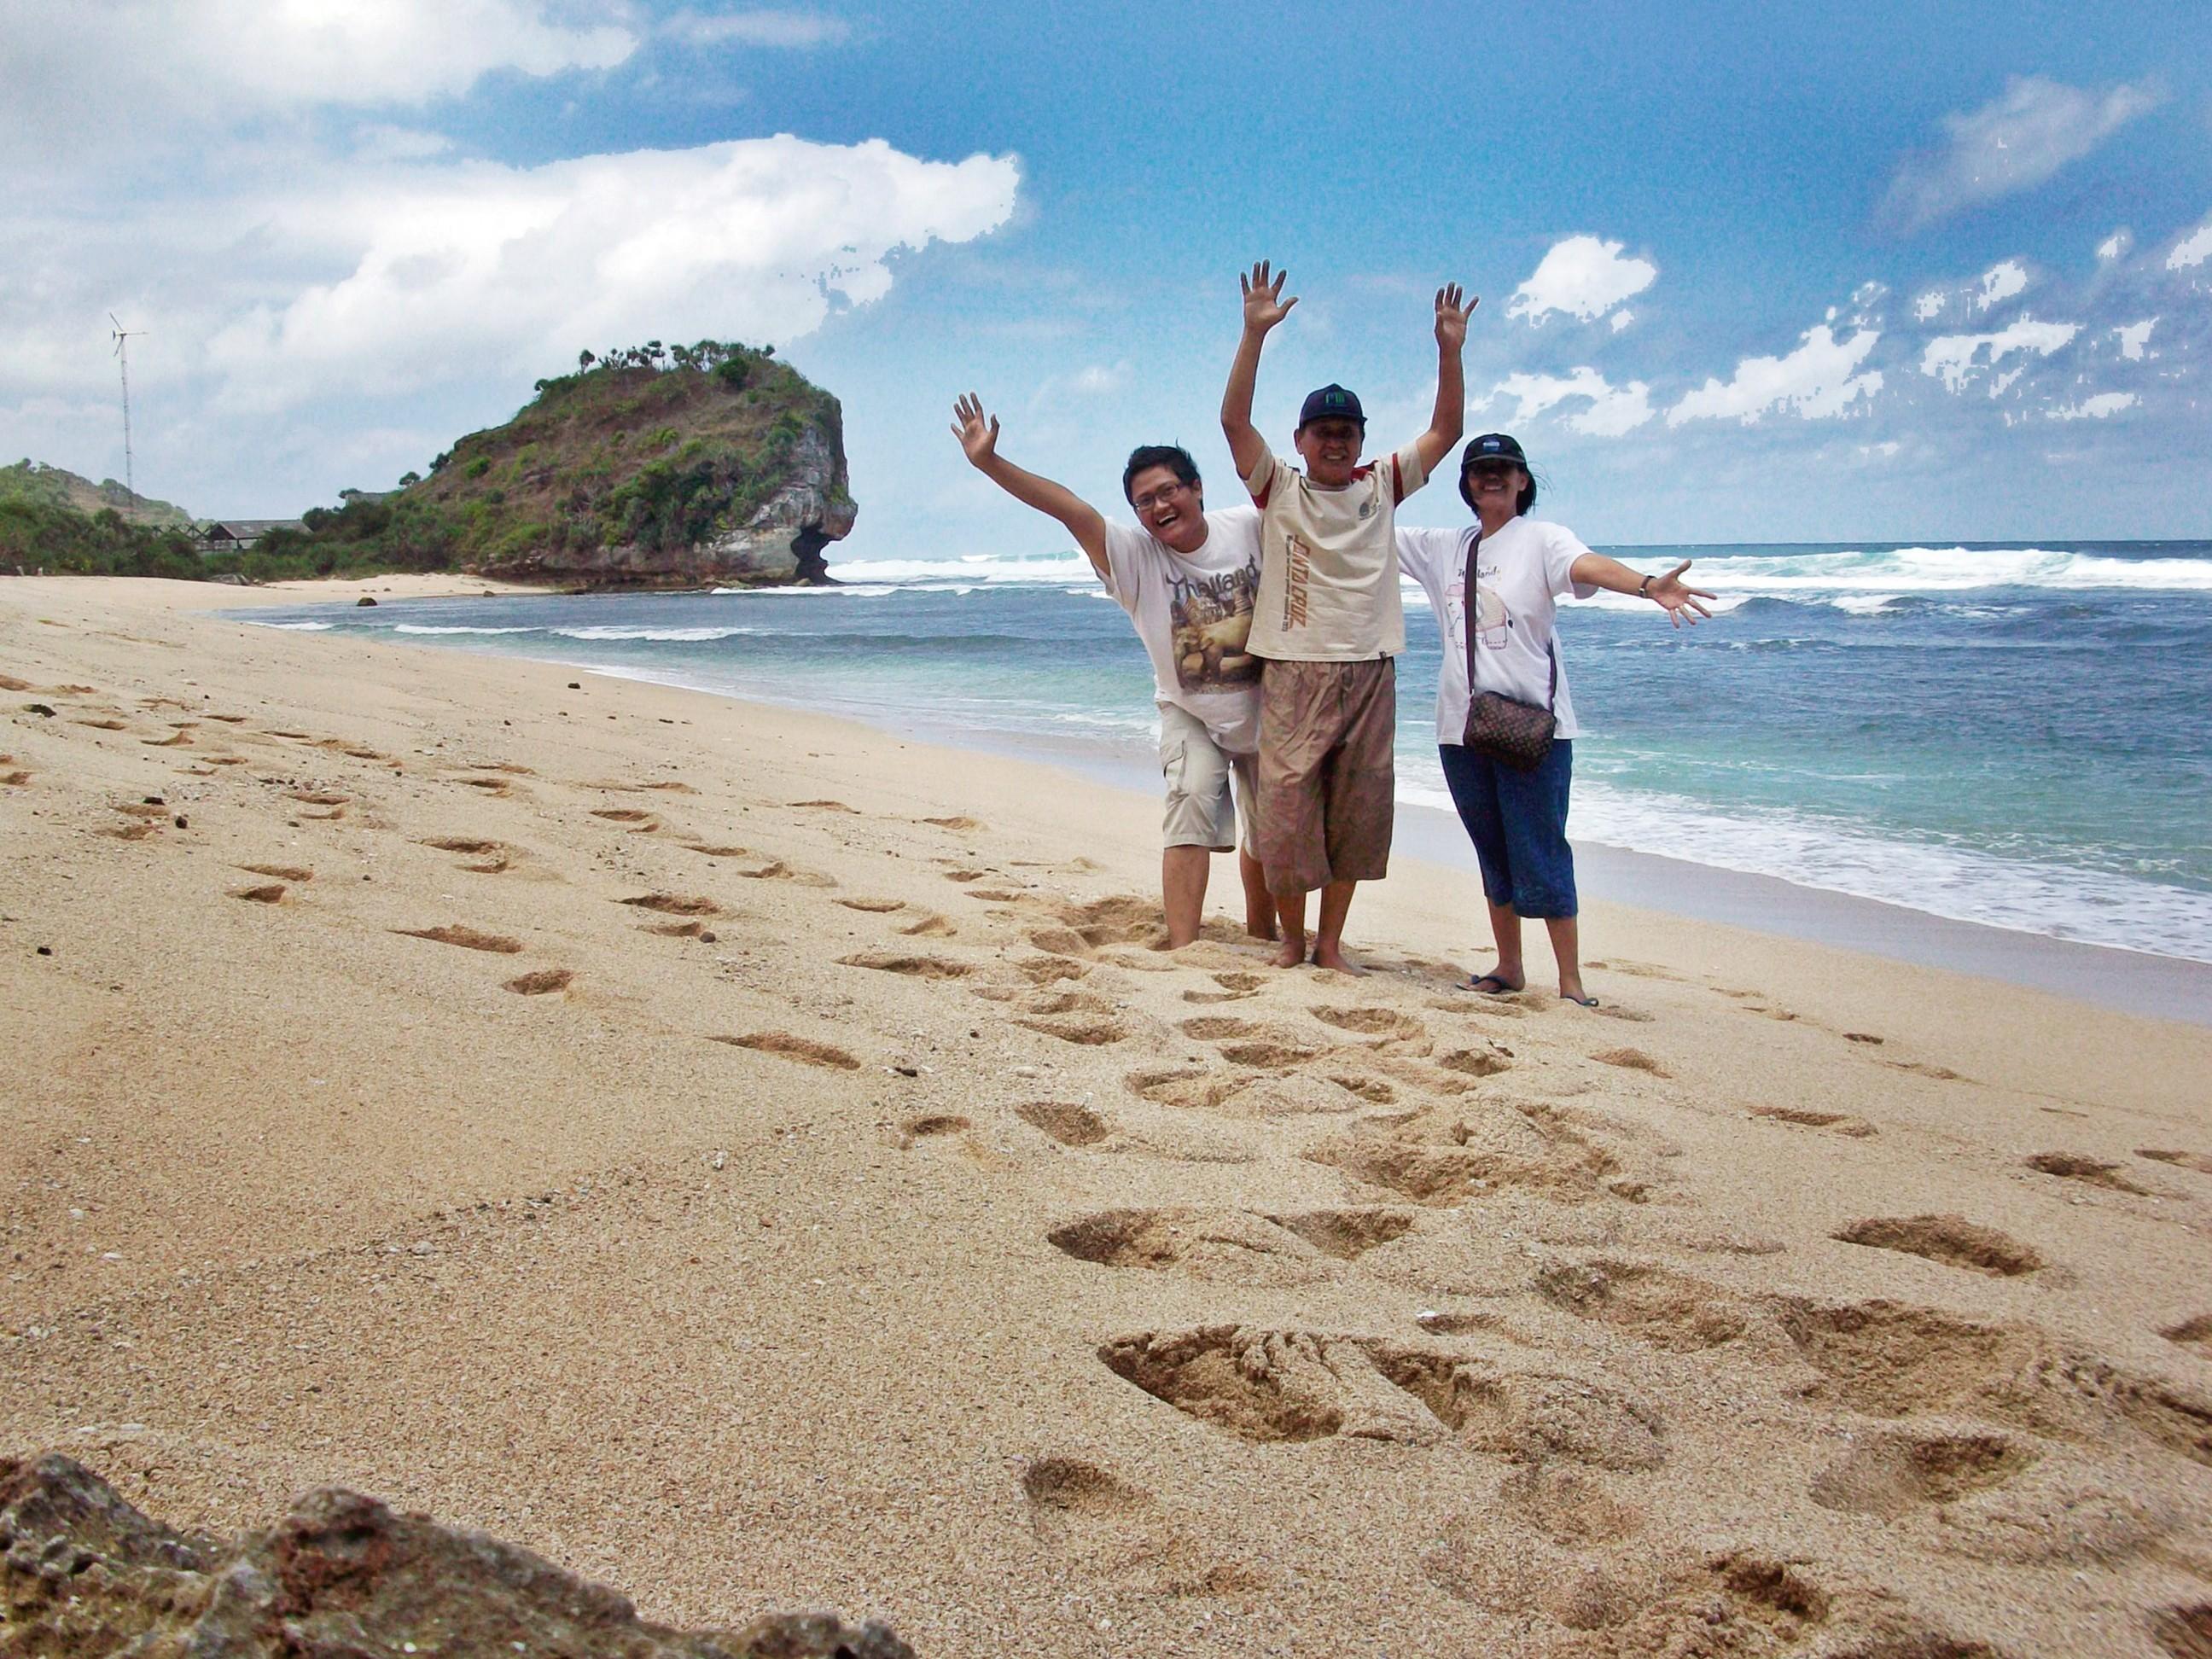 Beginilah Cantiknya Pantai Pasir Putih Di Selatan Yogyakarta